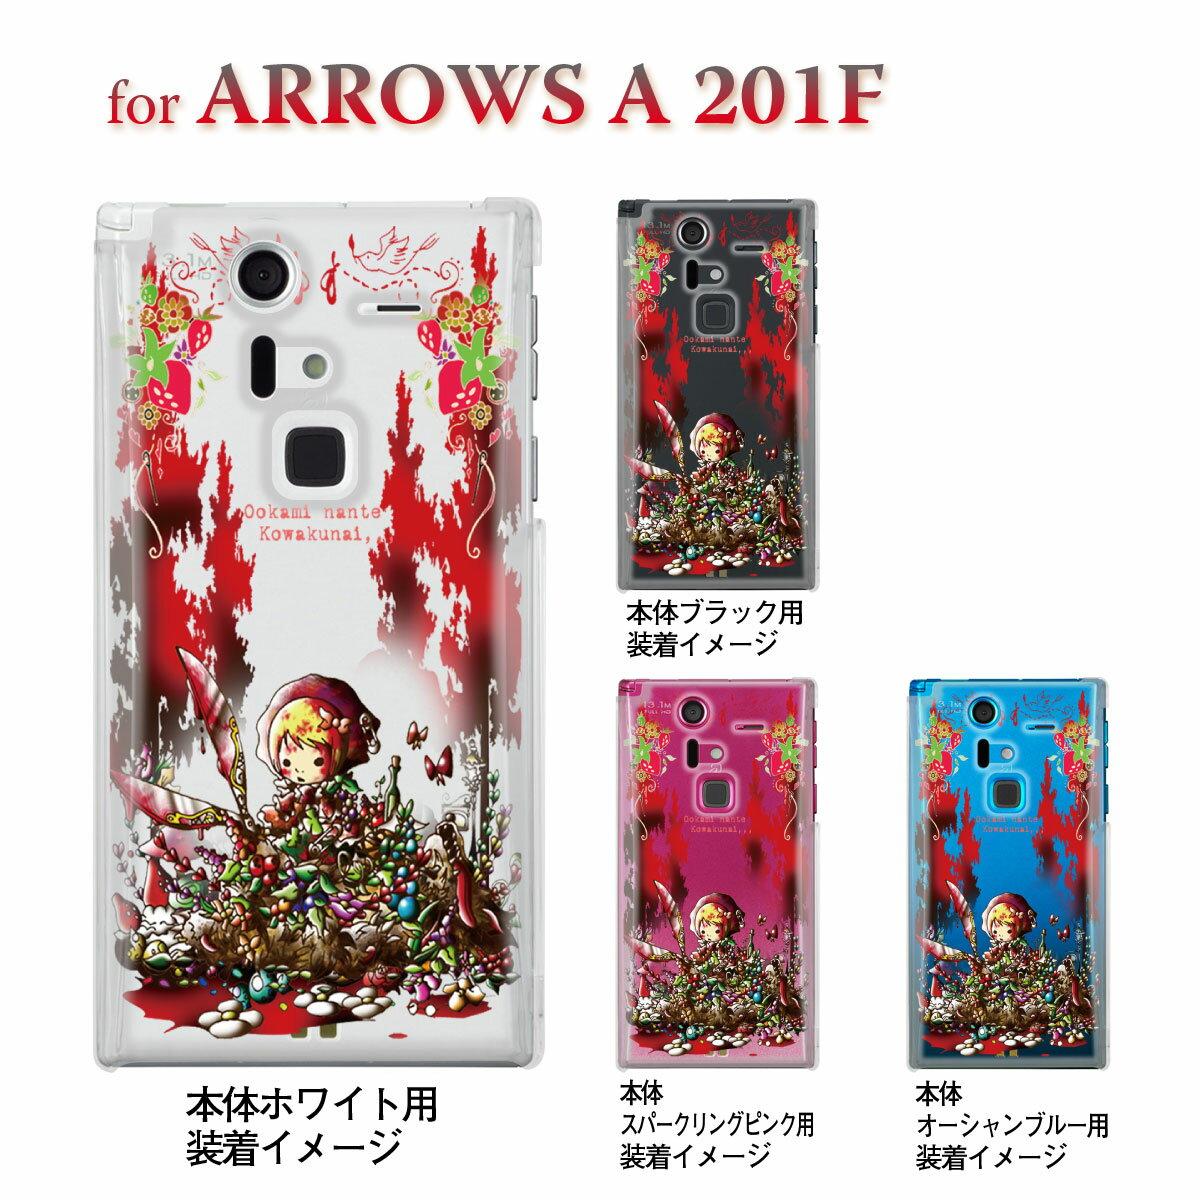 【Little World】【ARROWS A 201F】【201F】【Soft Bank】【カバー】【スマホケース】【クリアケース】【アート】【赤ずきんちゃん】【オオカミなんてコワクない】【グリム童話】 25-201f-am0027